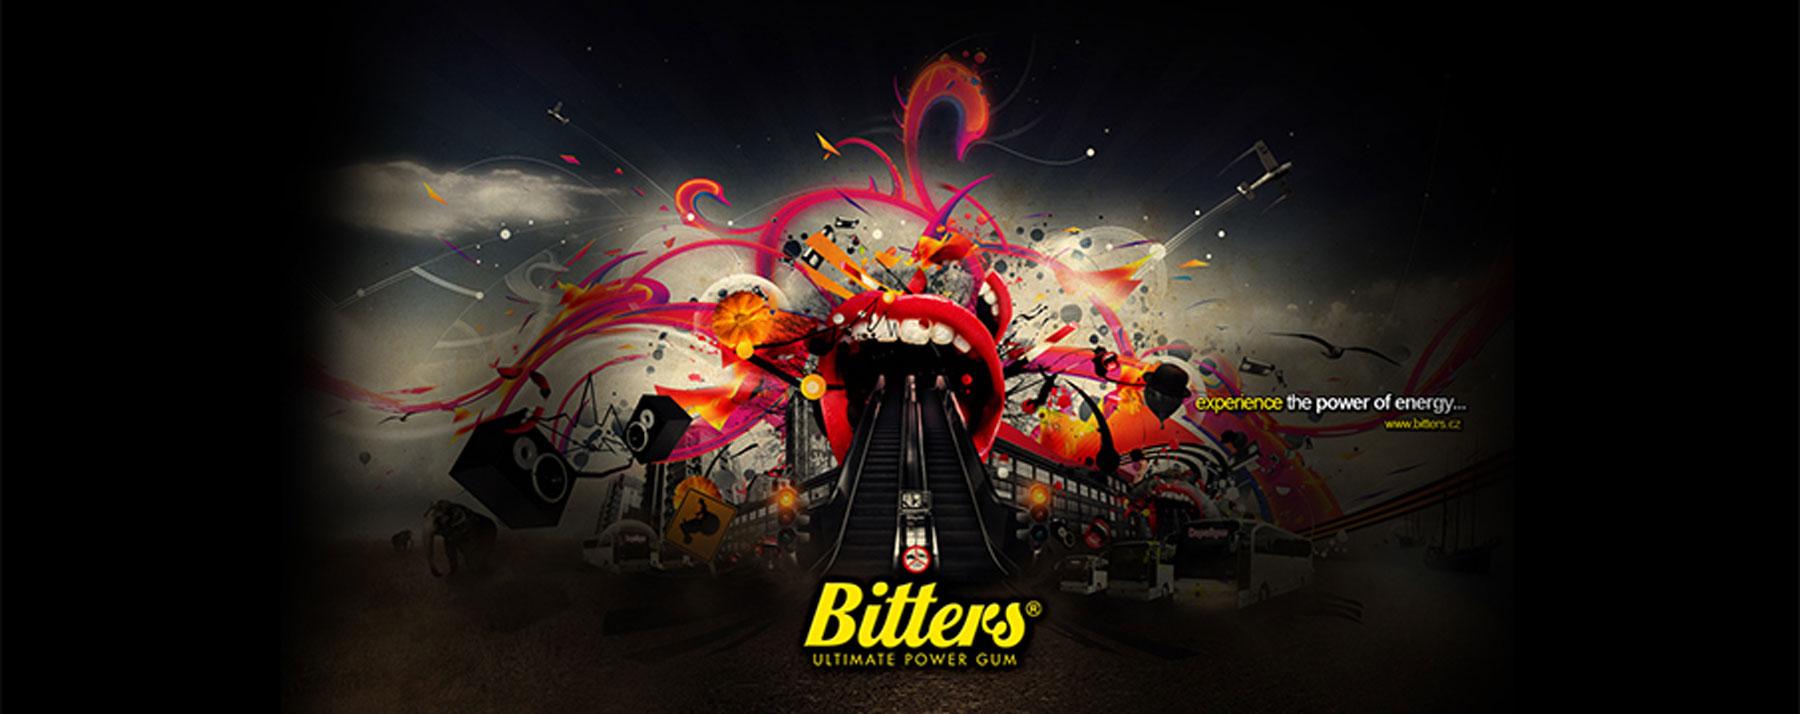 Bitters®